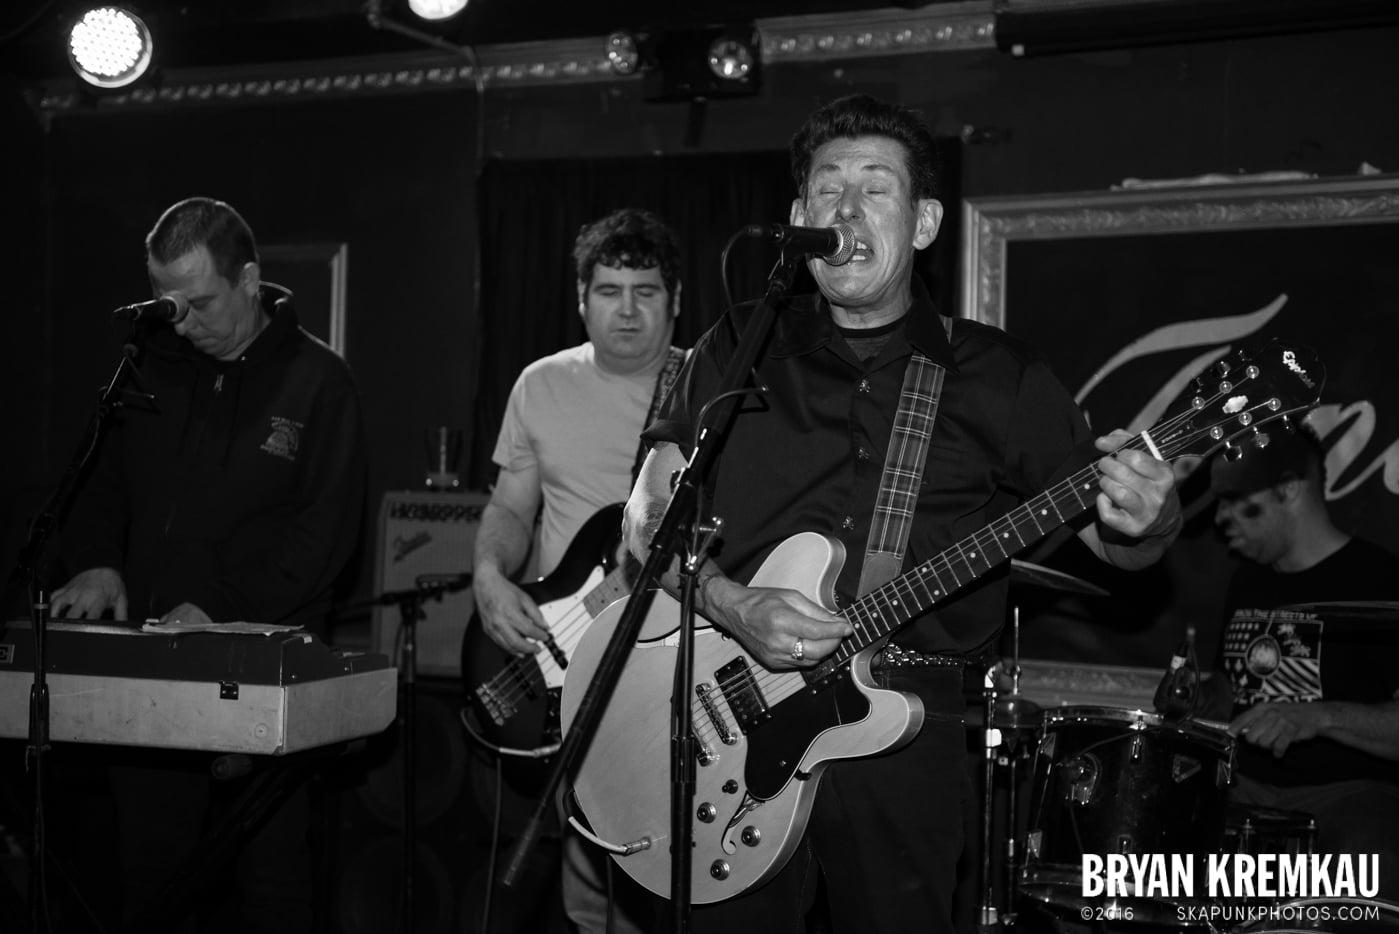 Roddy Radiation & The Scotch Bonnets @ Fontana's, NYC - 4.25.15 (22)